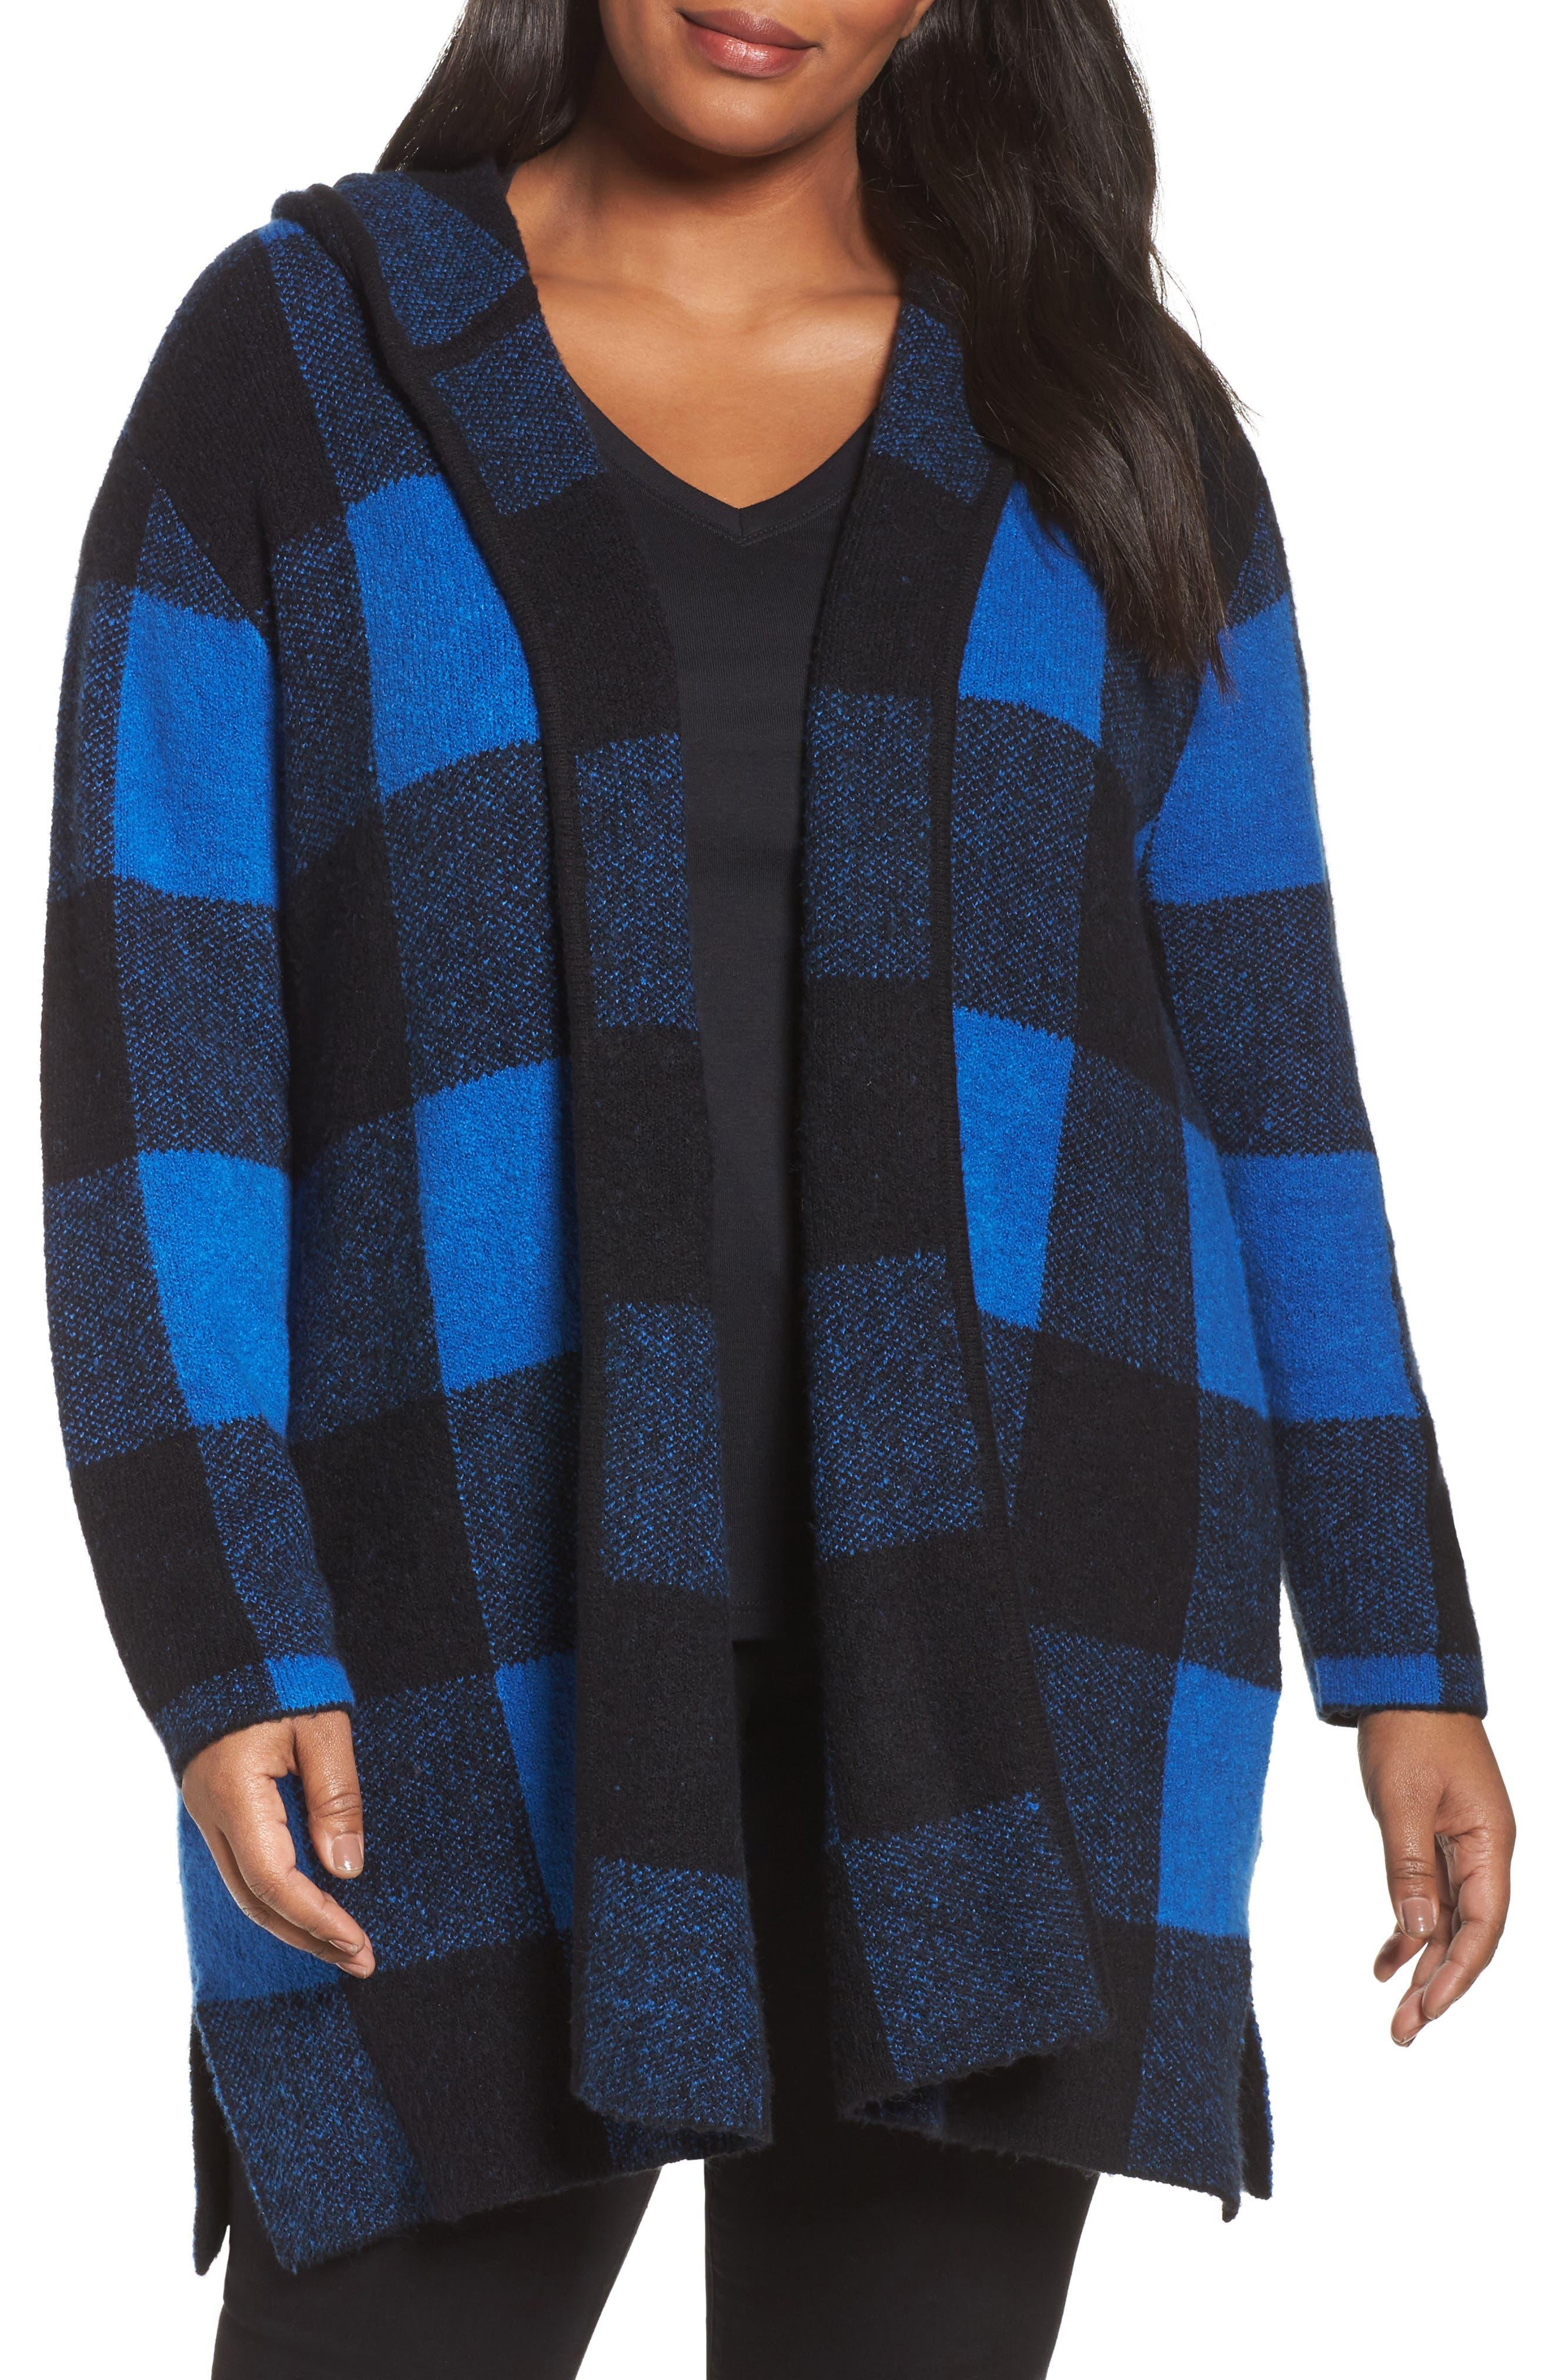 Plaid Hooded Sweater Coatigan,                         Main,                         color, Blue Checkerboard Jacquard